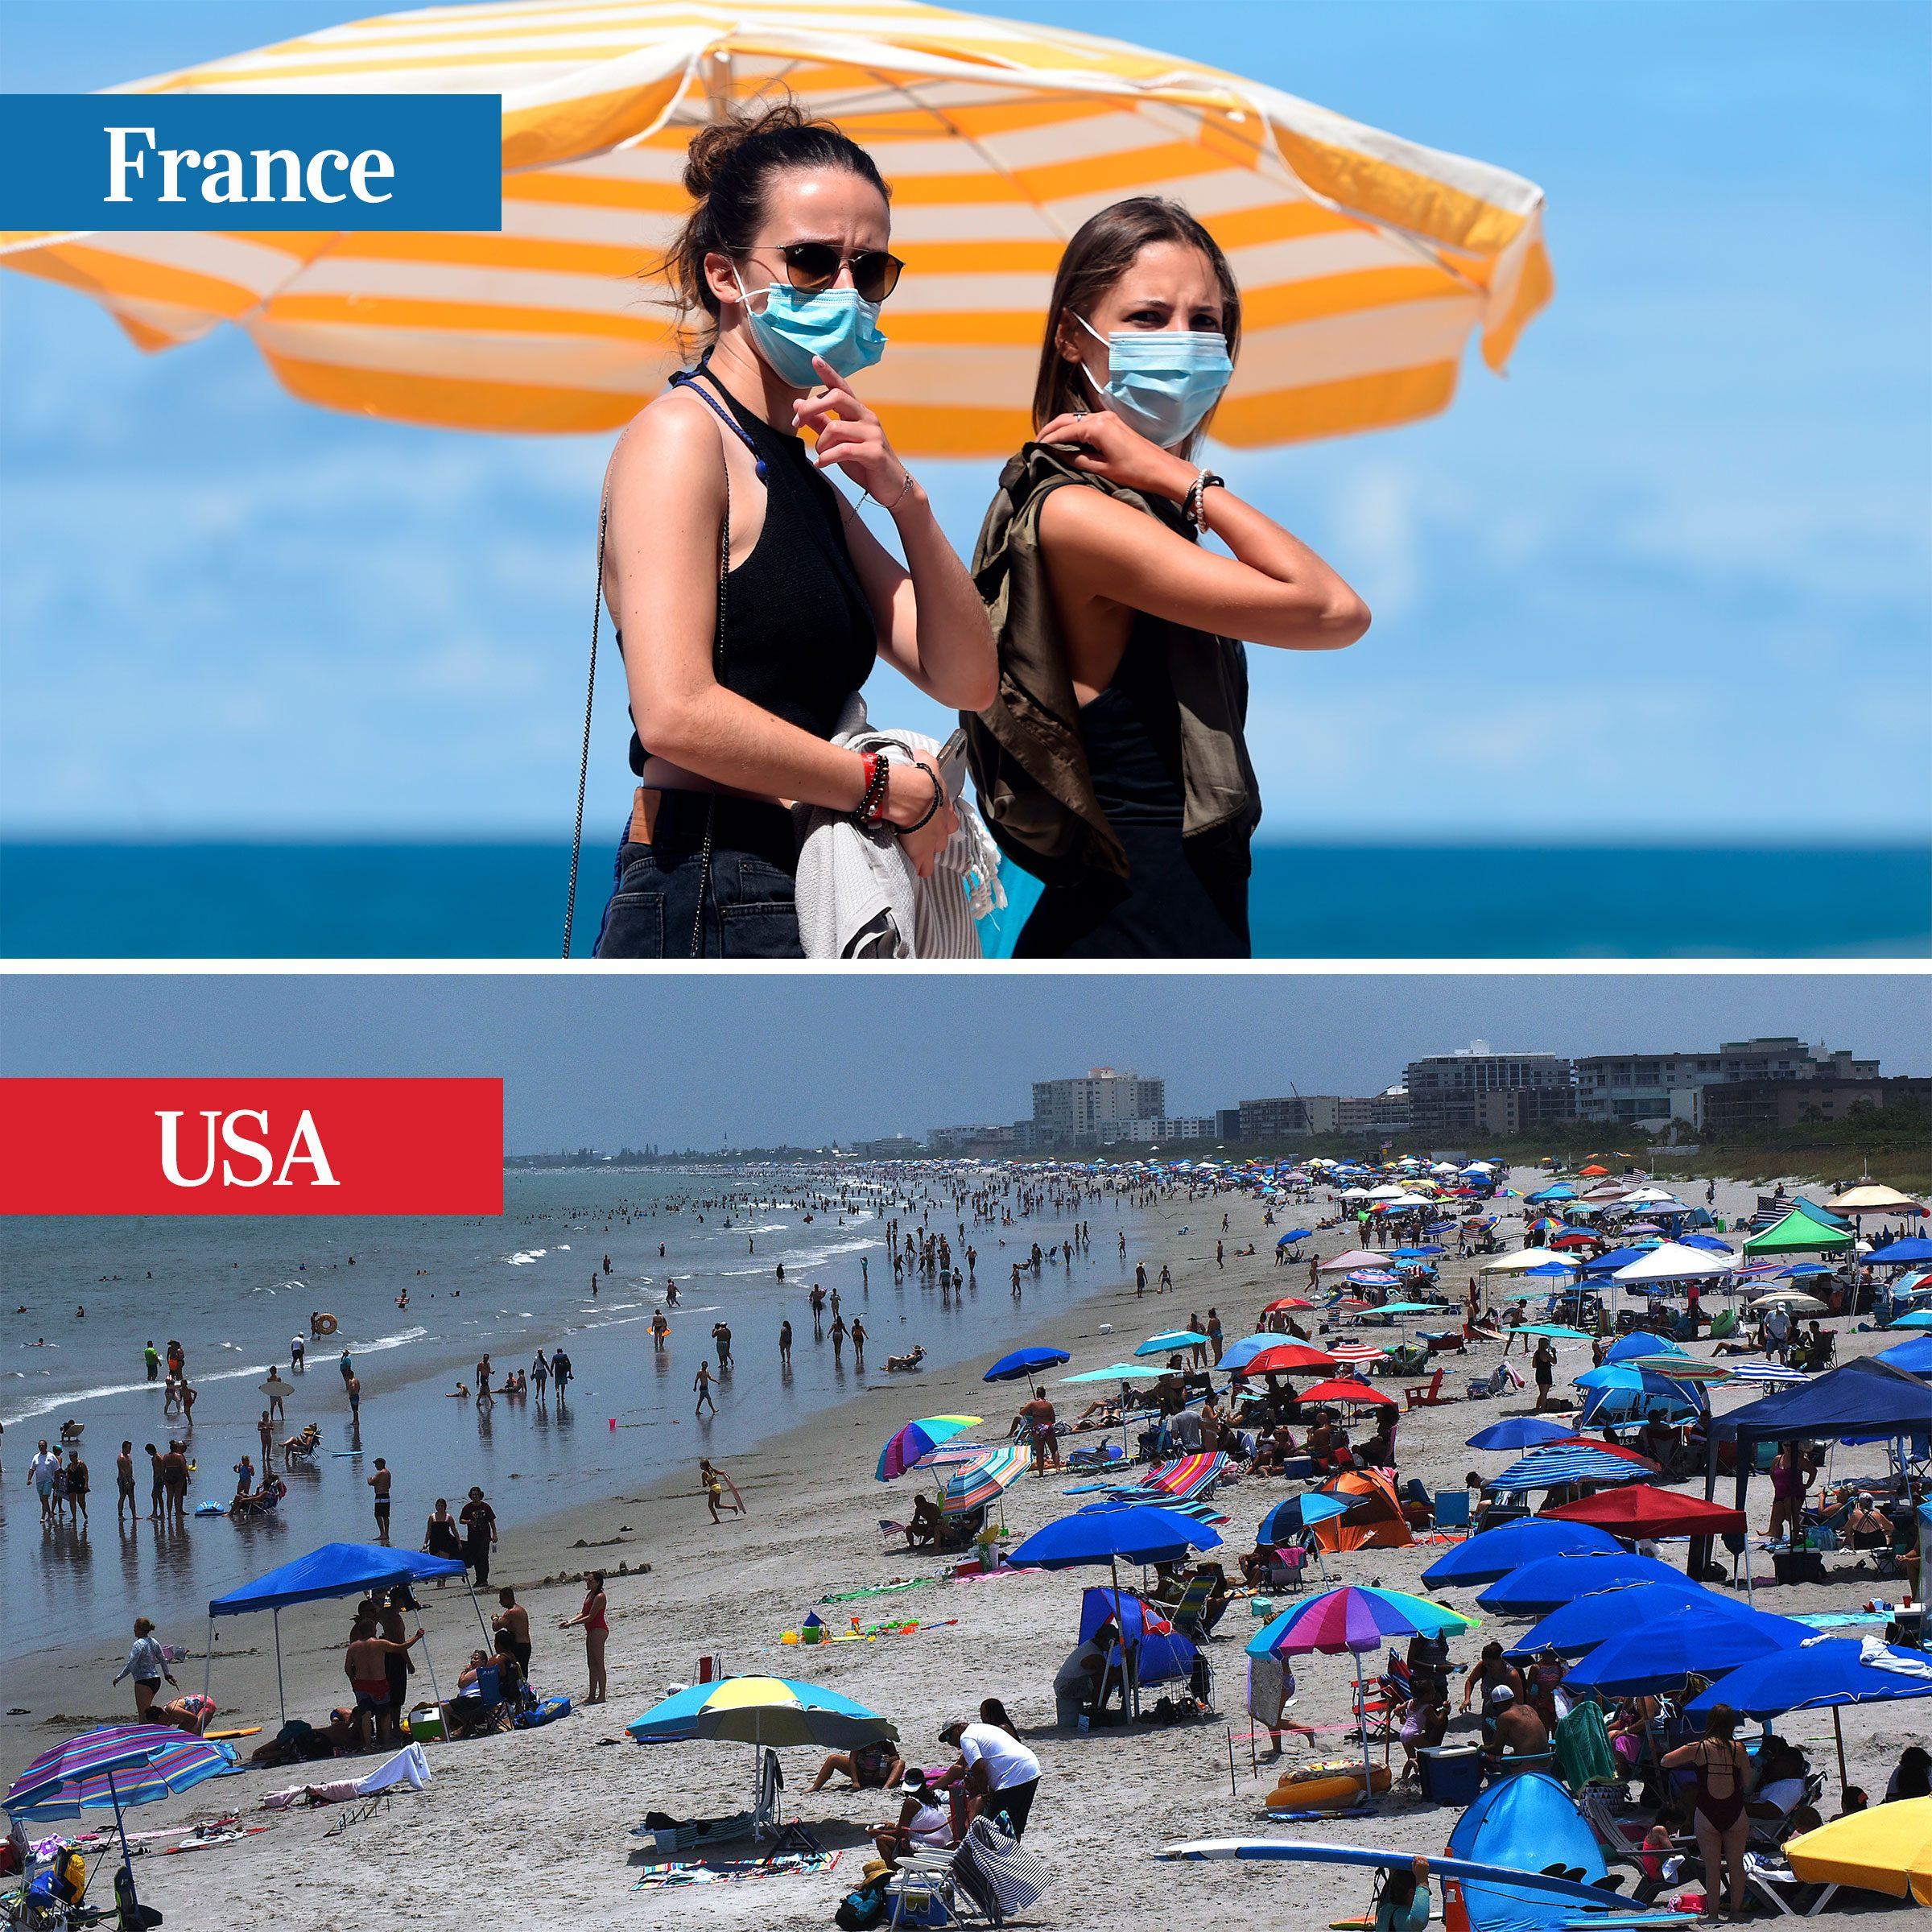 france vs usa - beaches